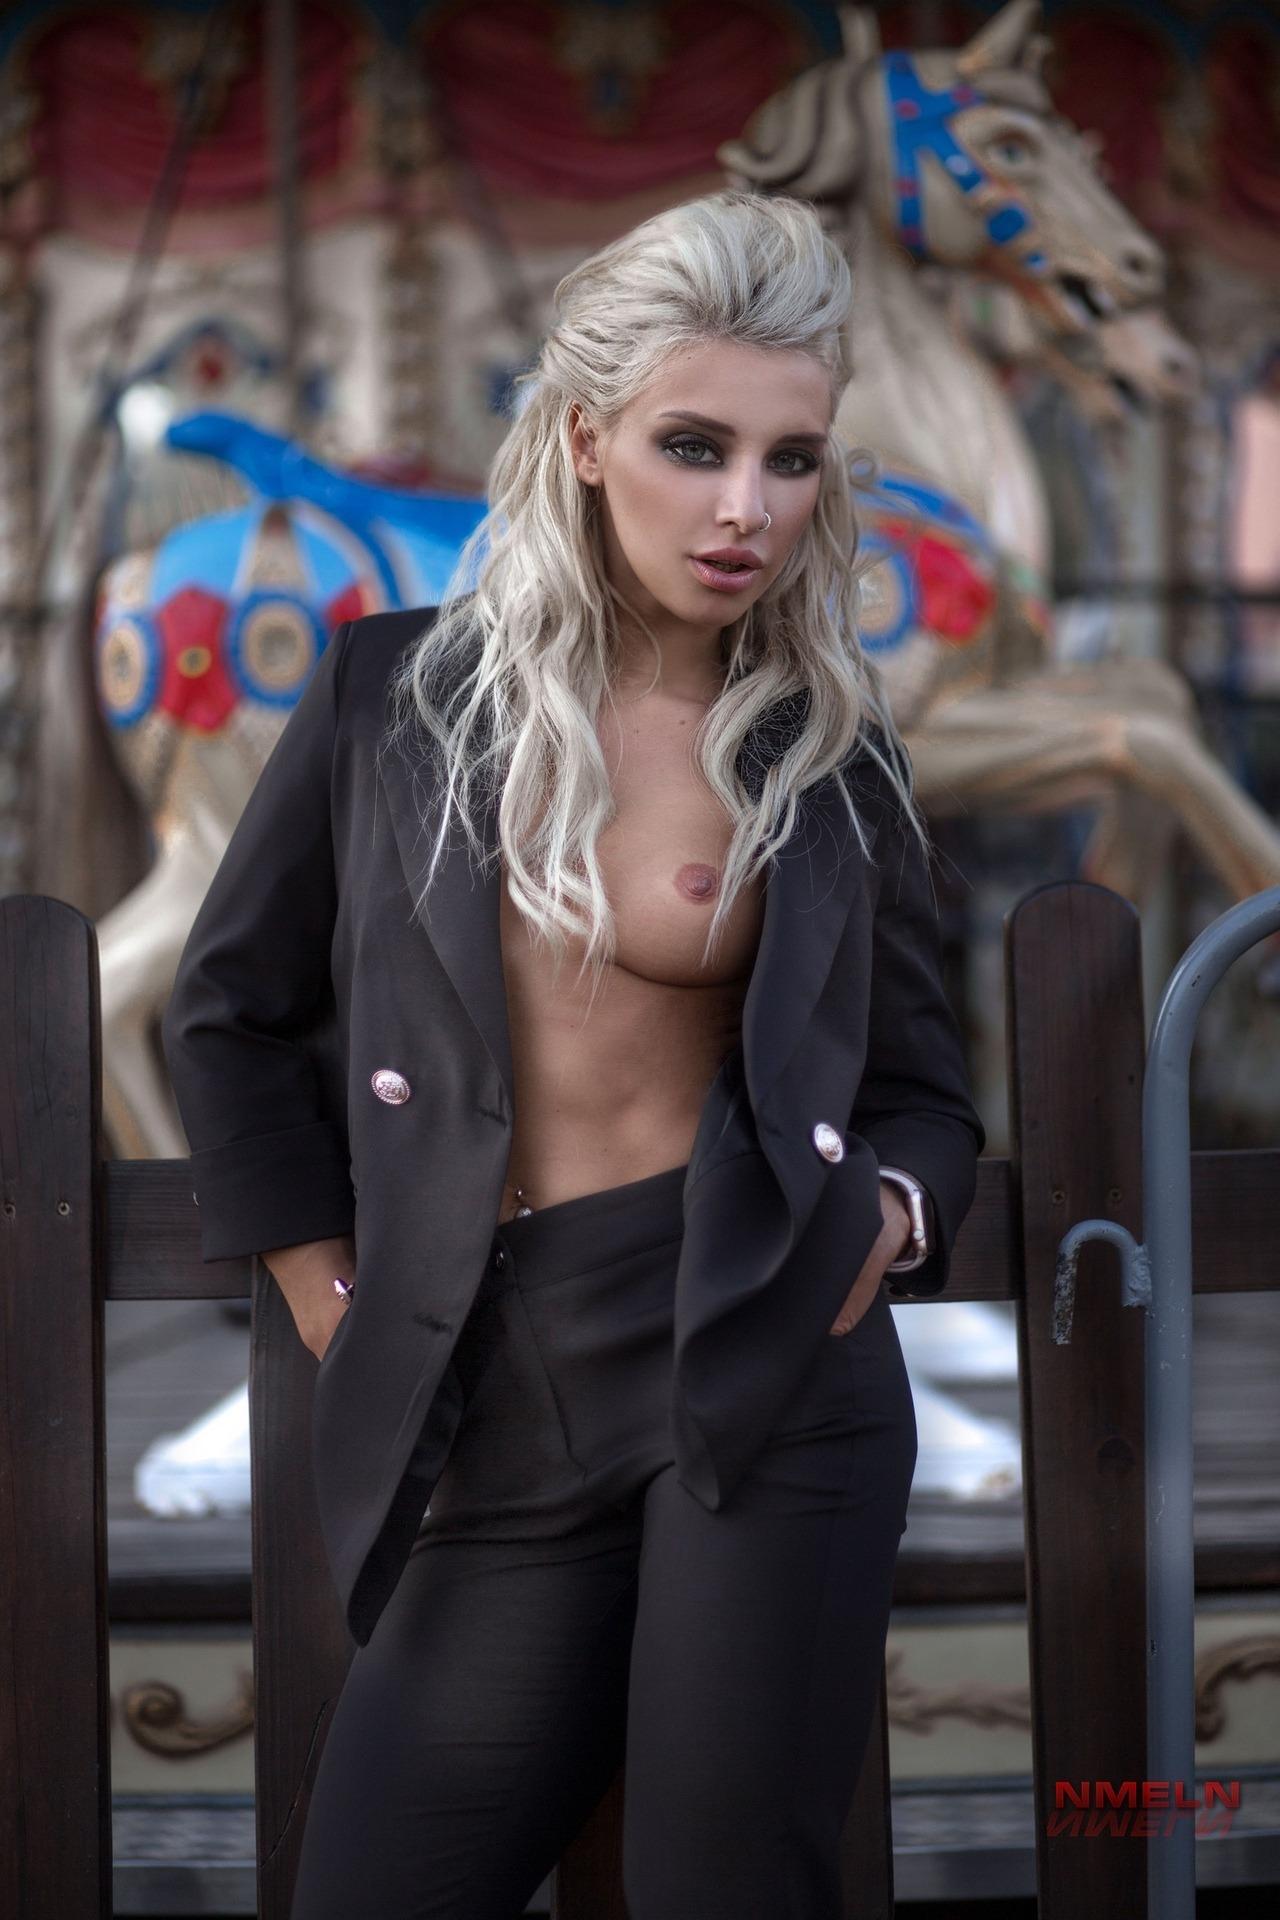 Yulia Menavenskova